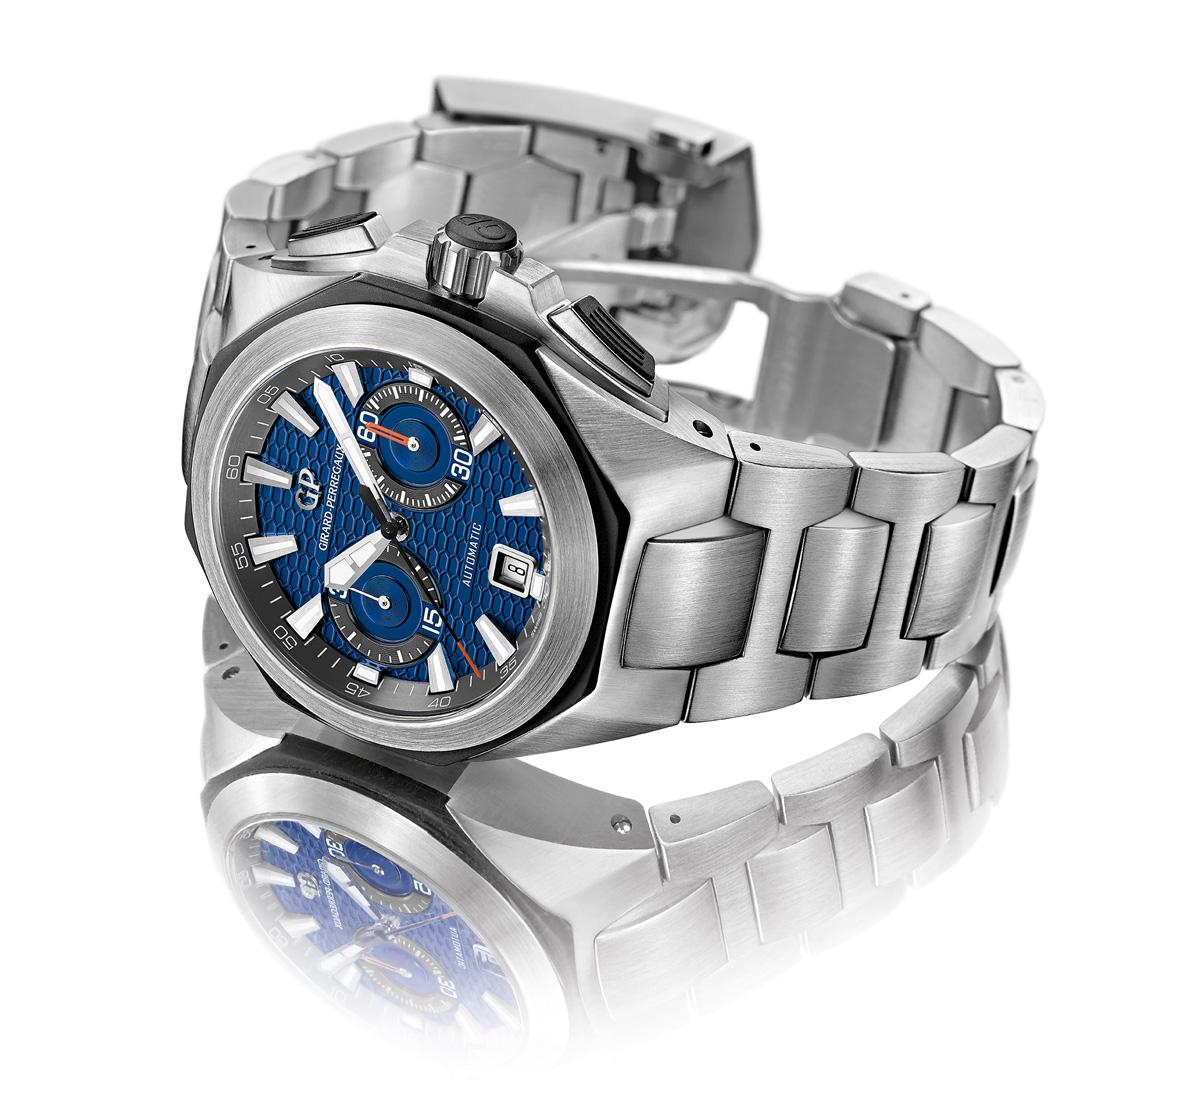 Girard-Perregaux-Chrono-Hawk-Steel-Bracelet-283291